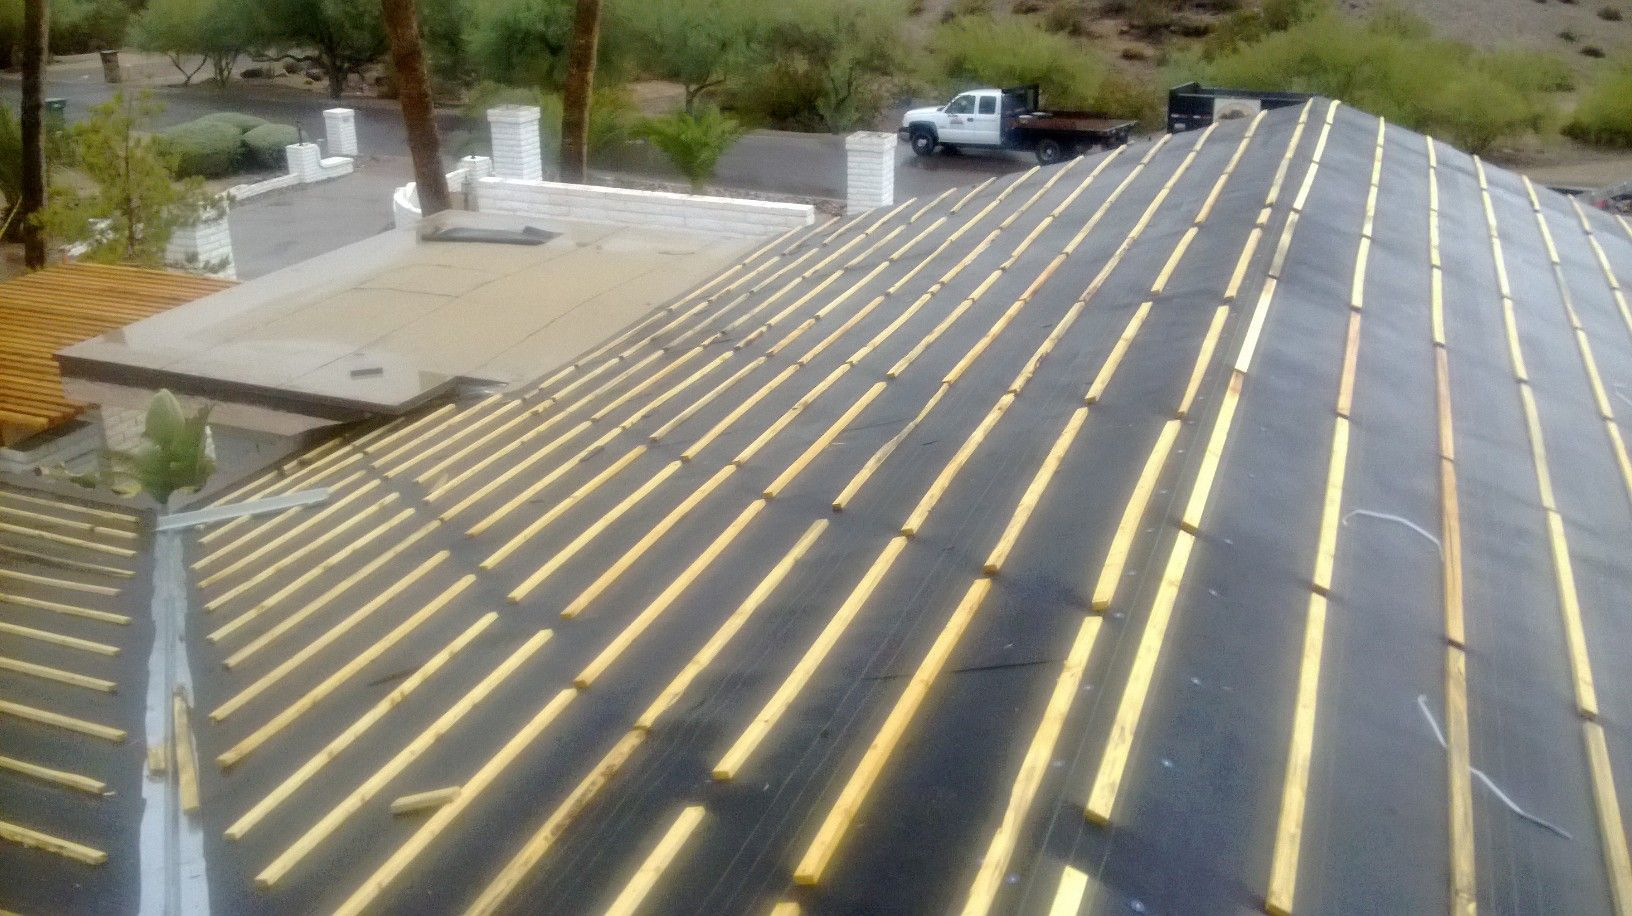 Tile Roof Underlayment Dry Plus Roofing Phoenix Az Outdoor Decor Roofing Decor